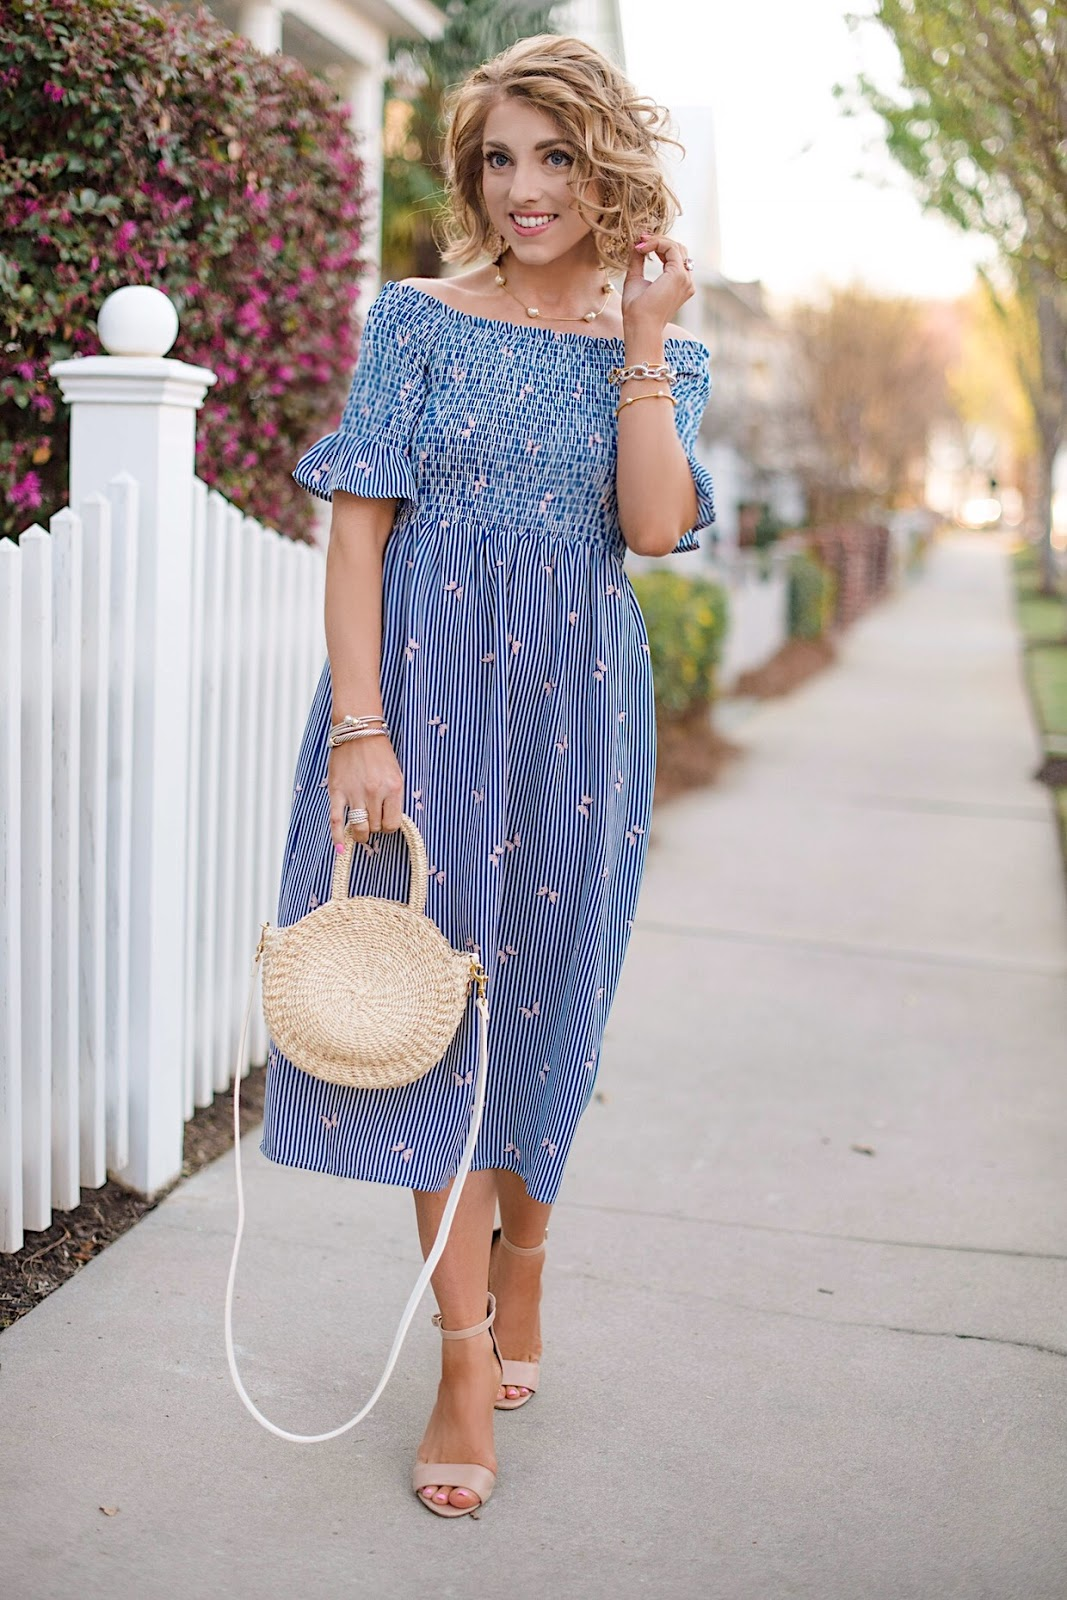 Butterfly Print OTS Midi Dress (Under $60) - Something Delightful Blog